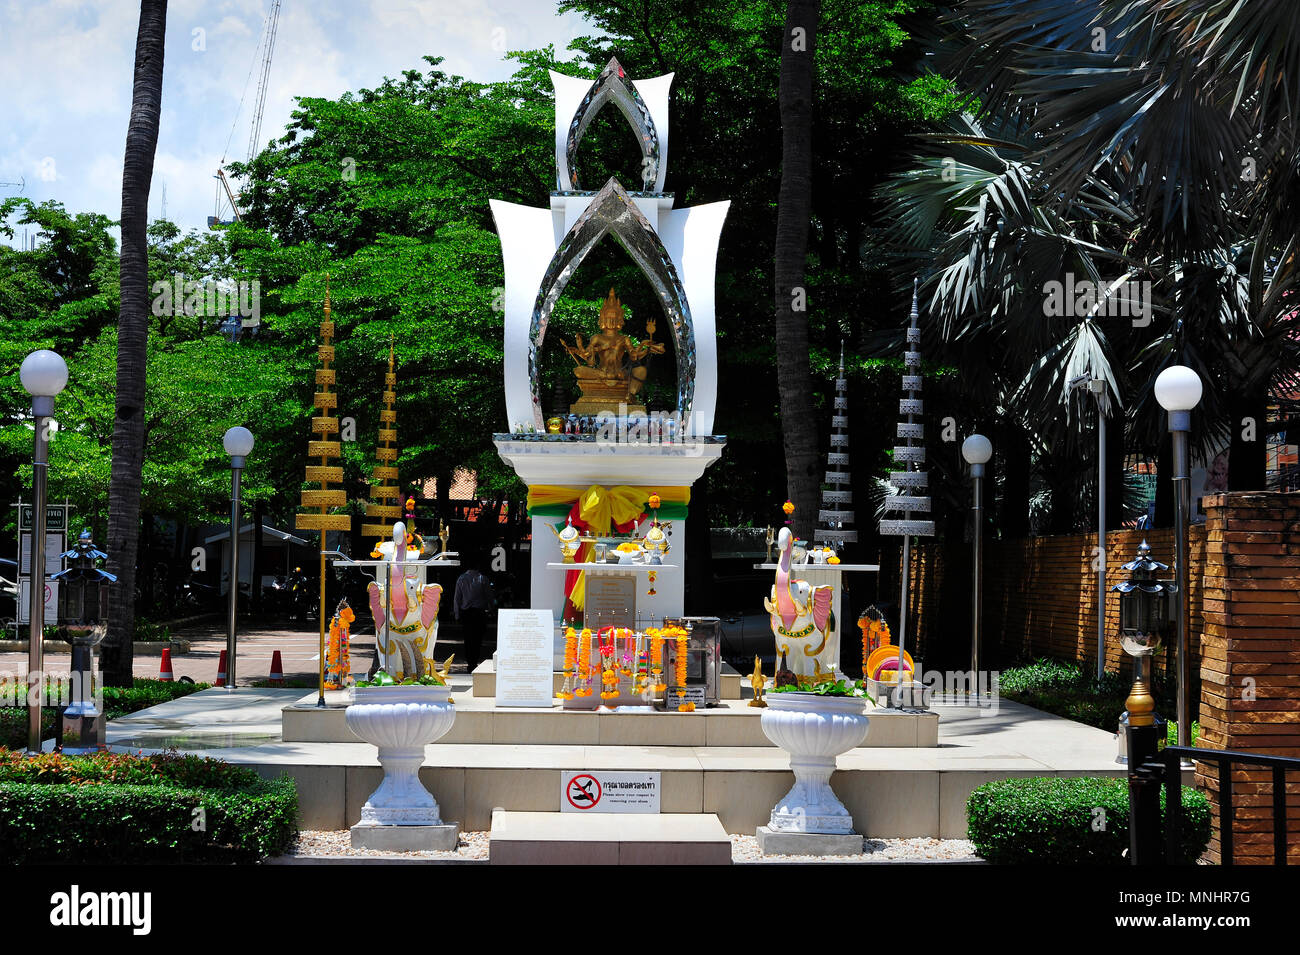 Buddhist Imagery at Avani Hotel Pattaya Thailand - Stock Image